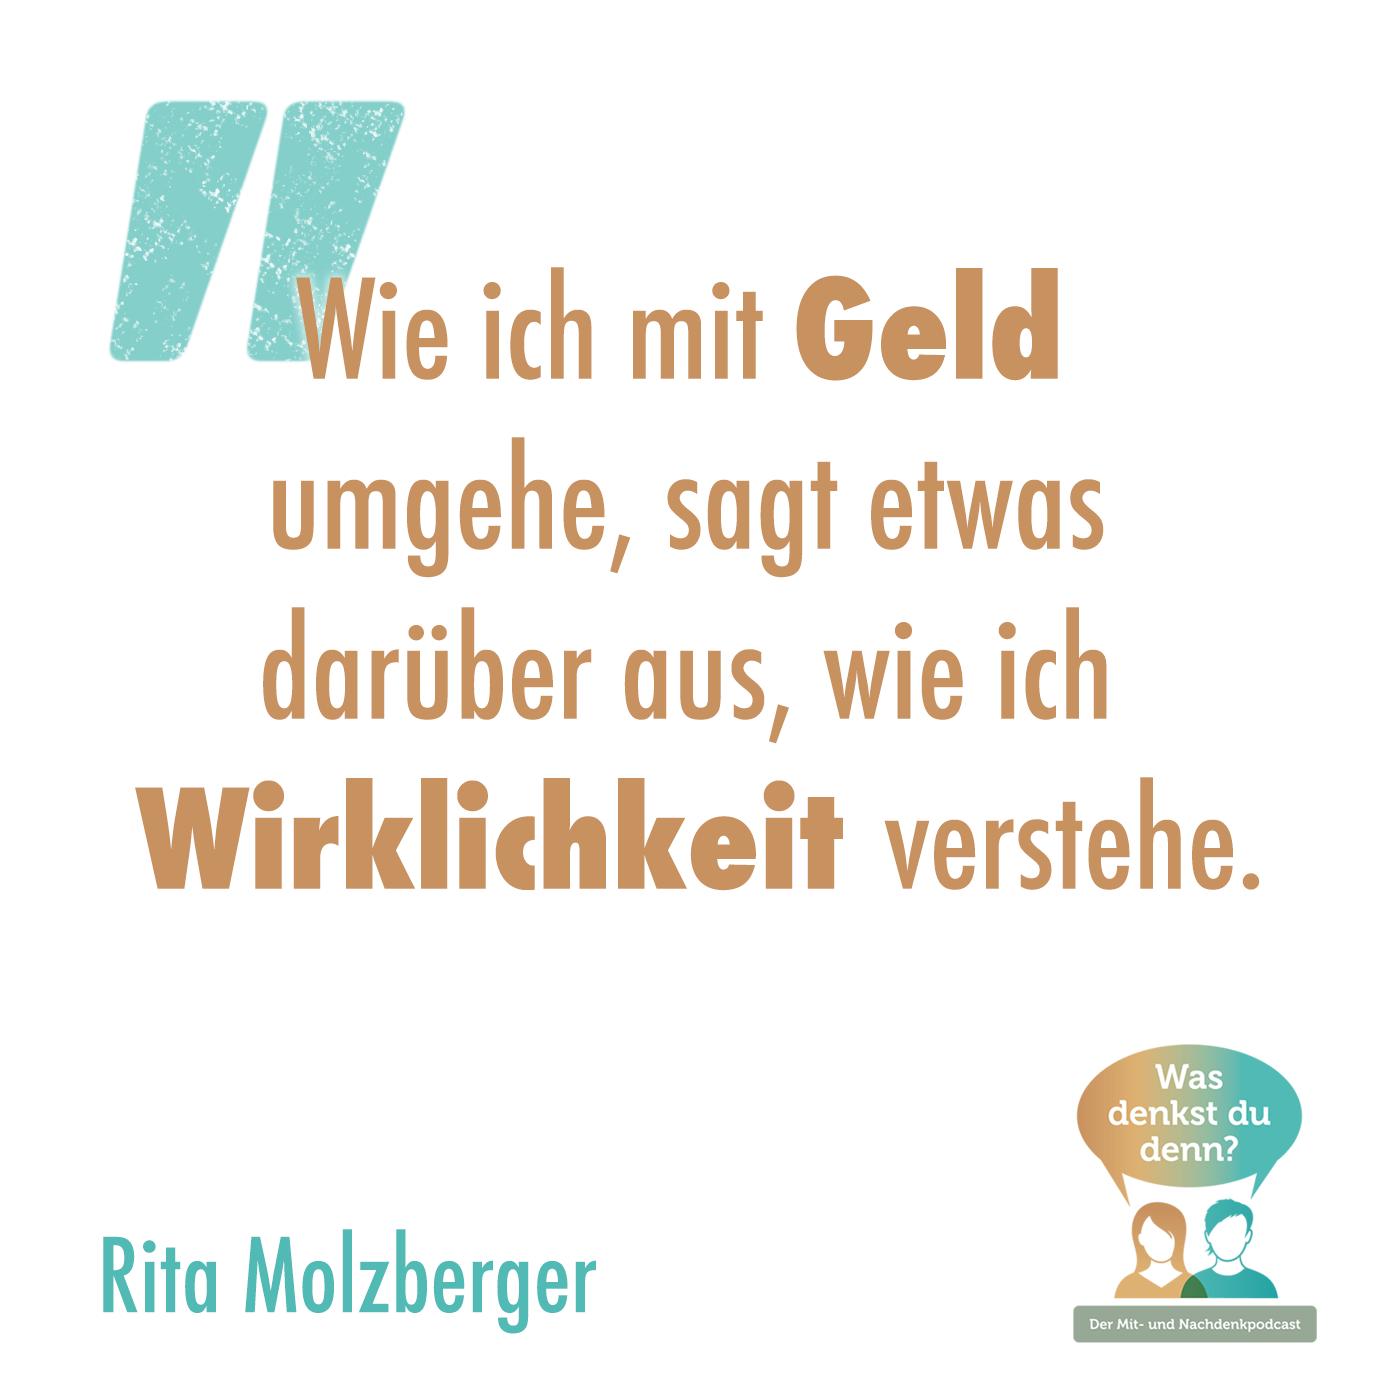 Zitat von Rita Molzberger